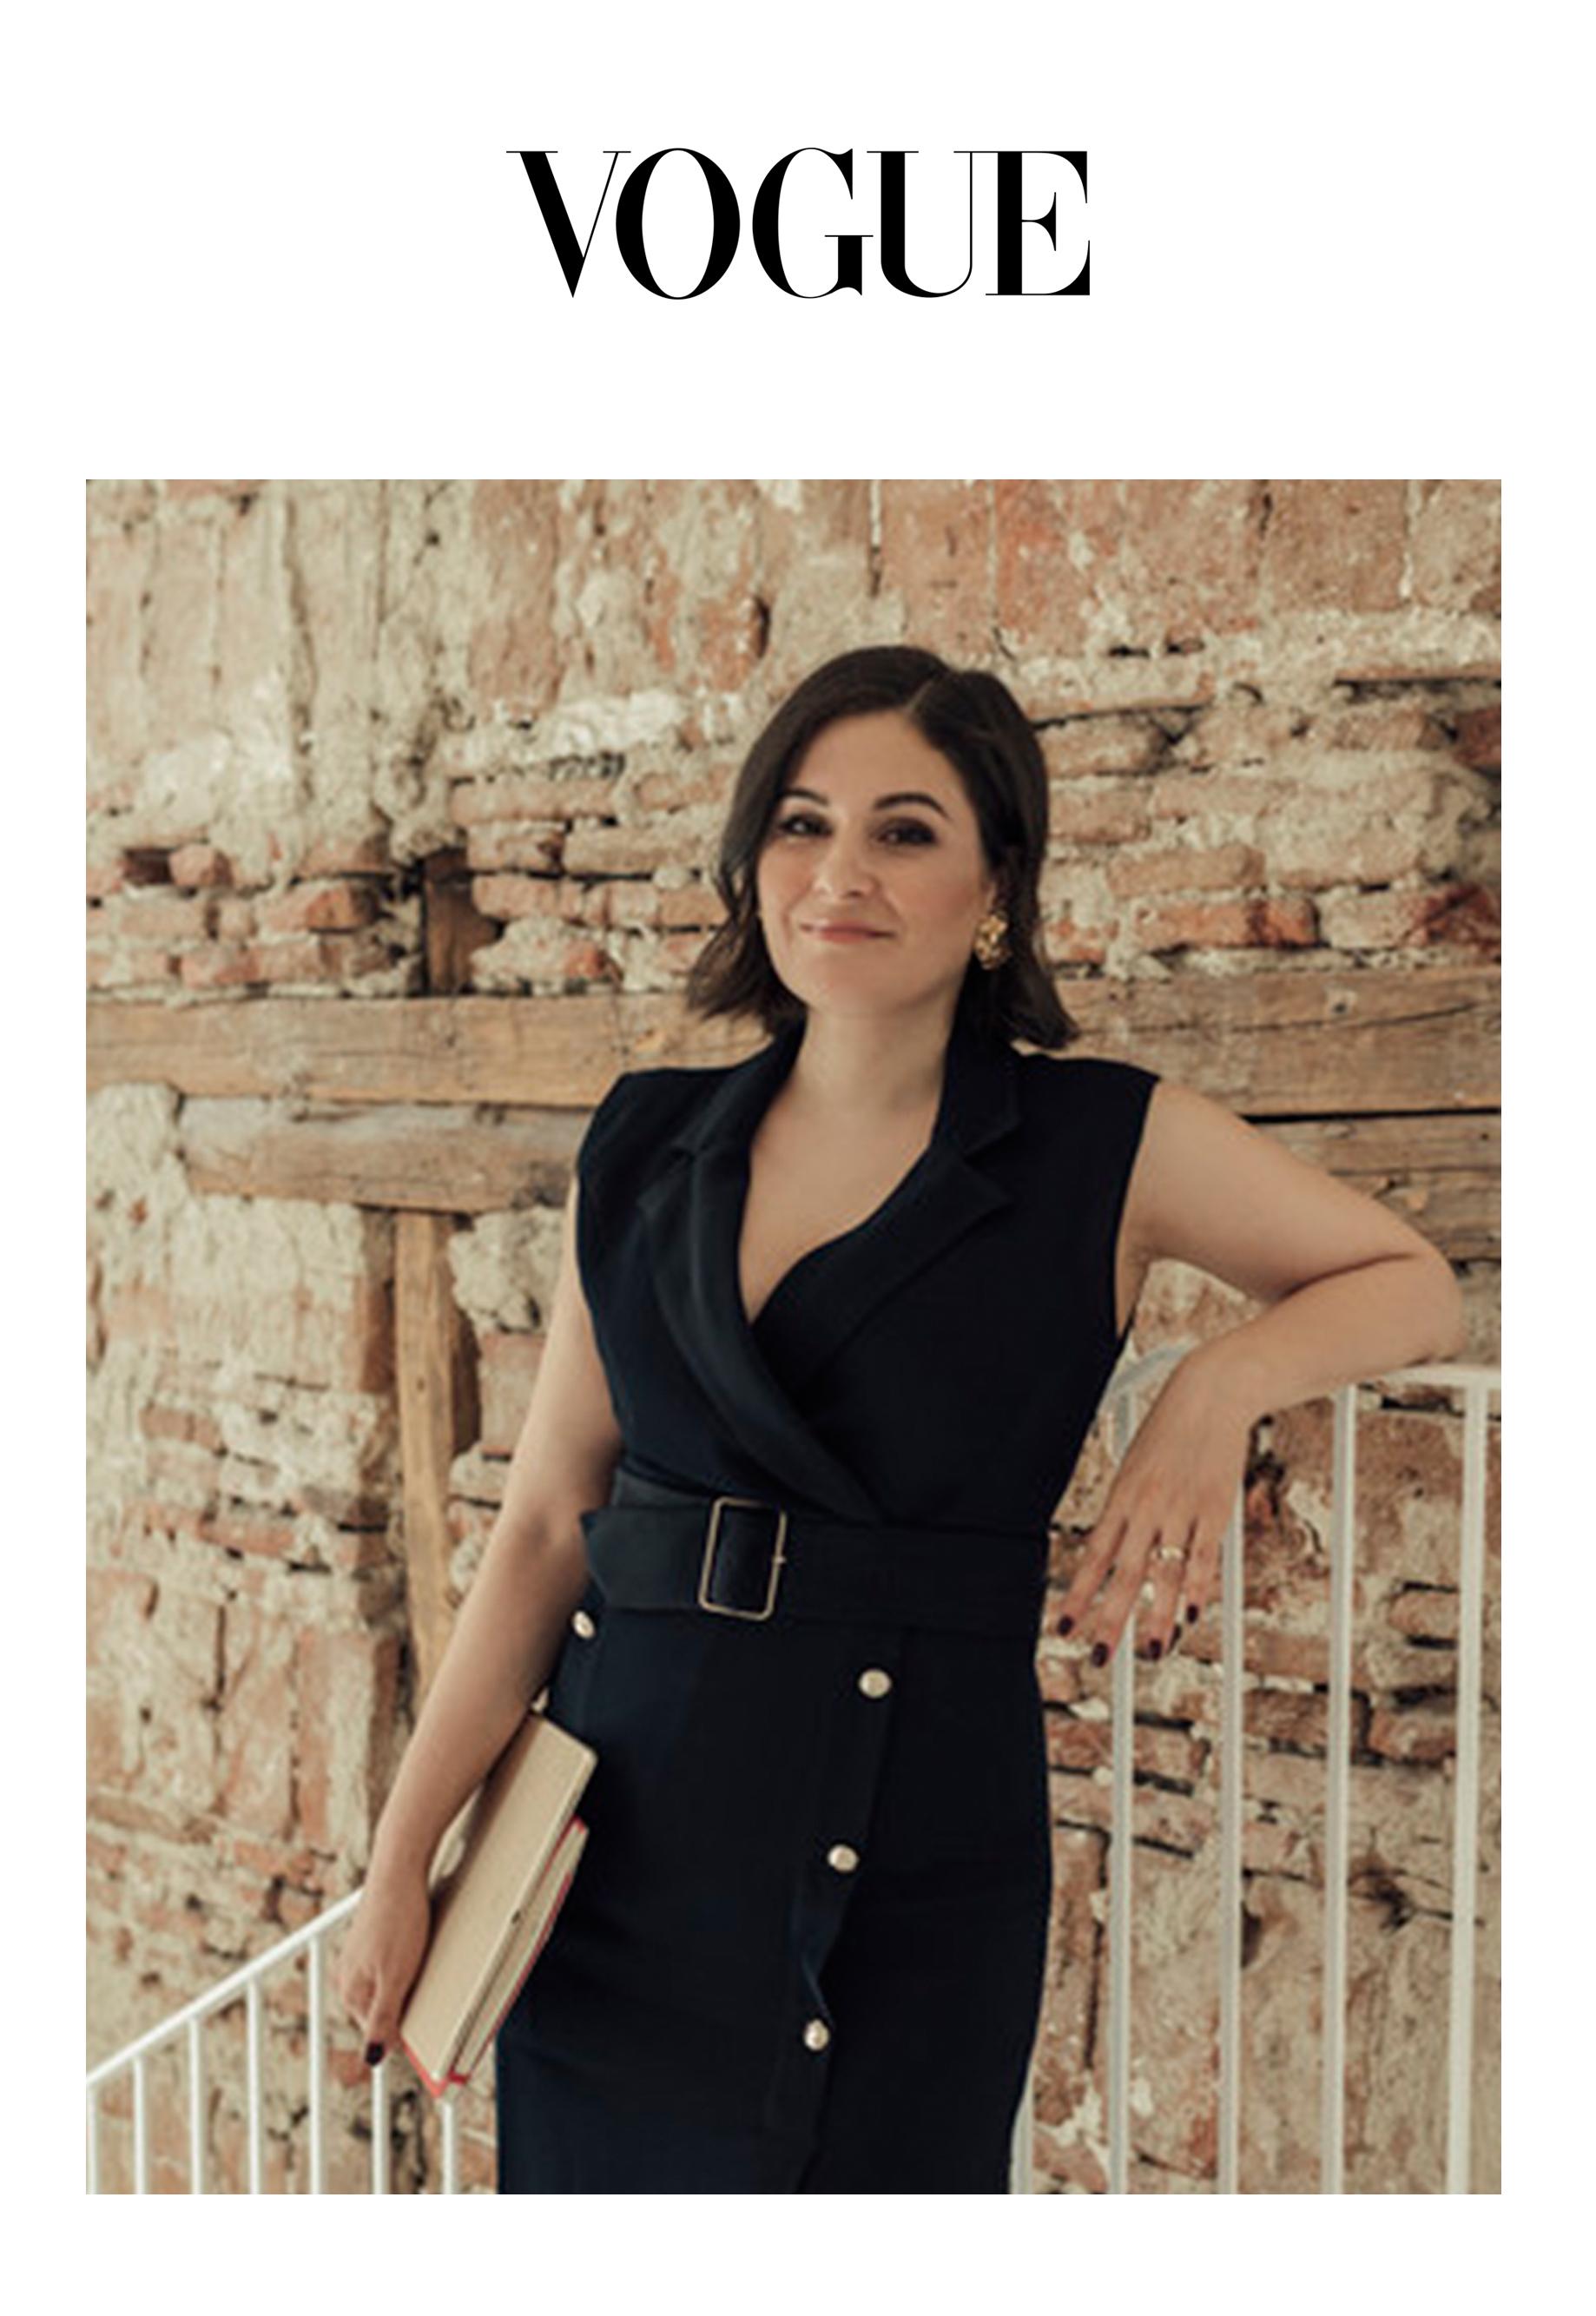 Valeria Domínguez: